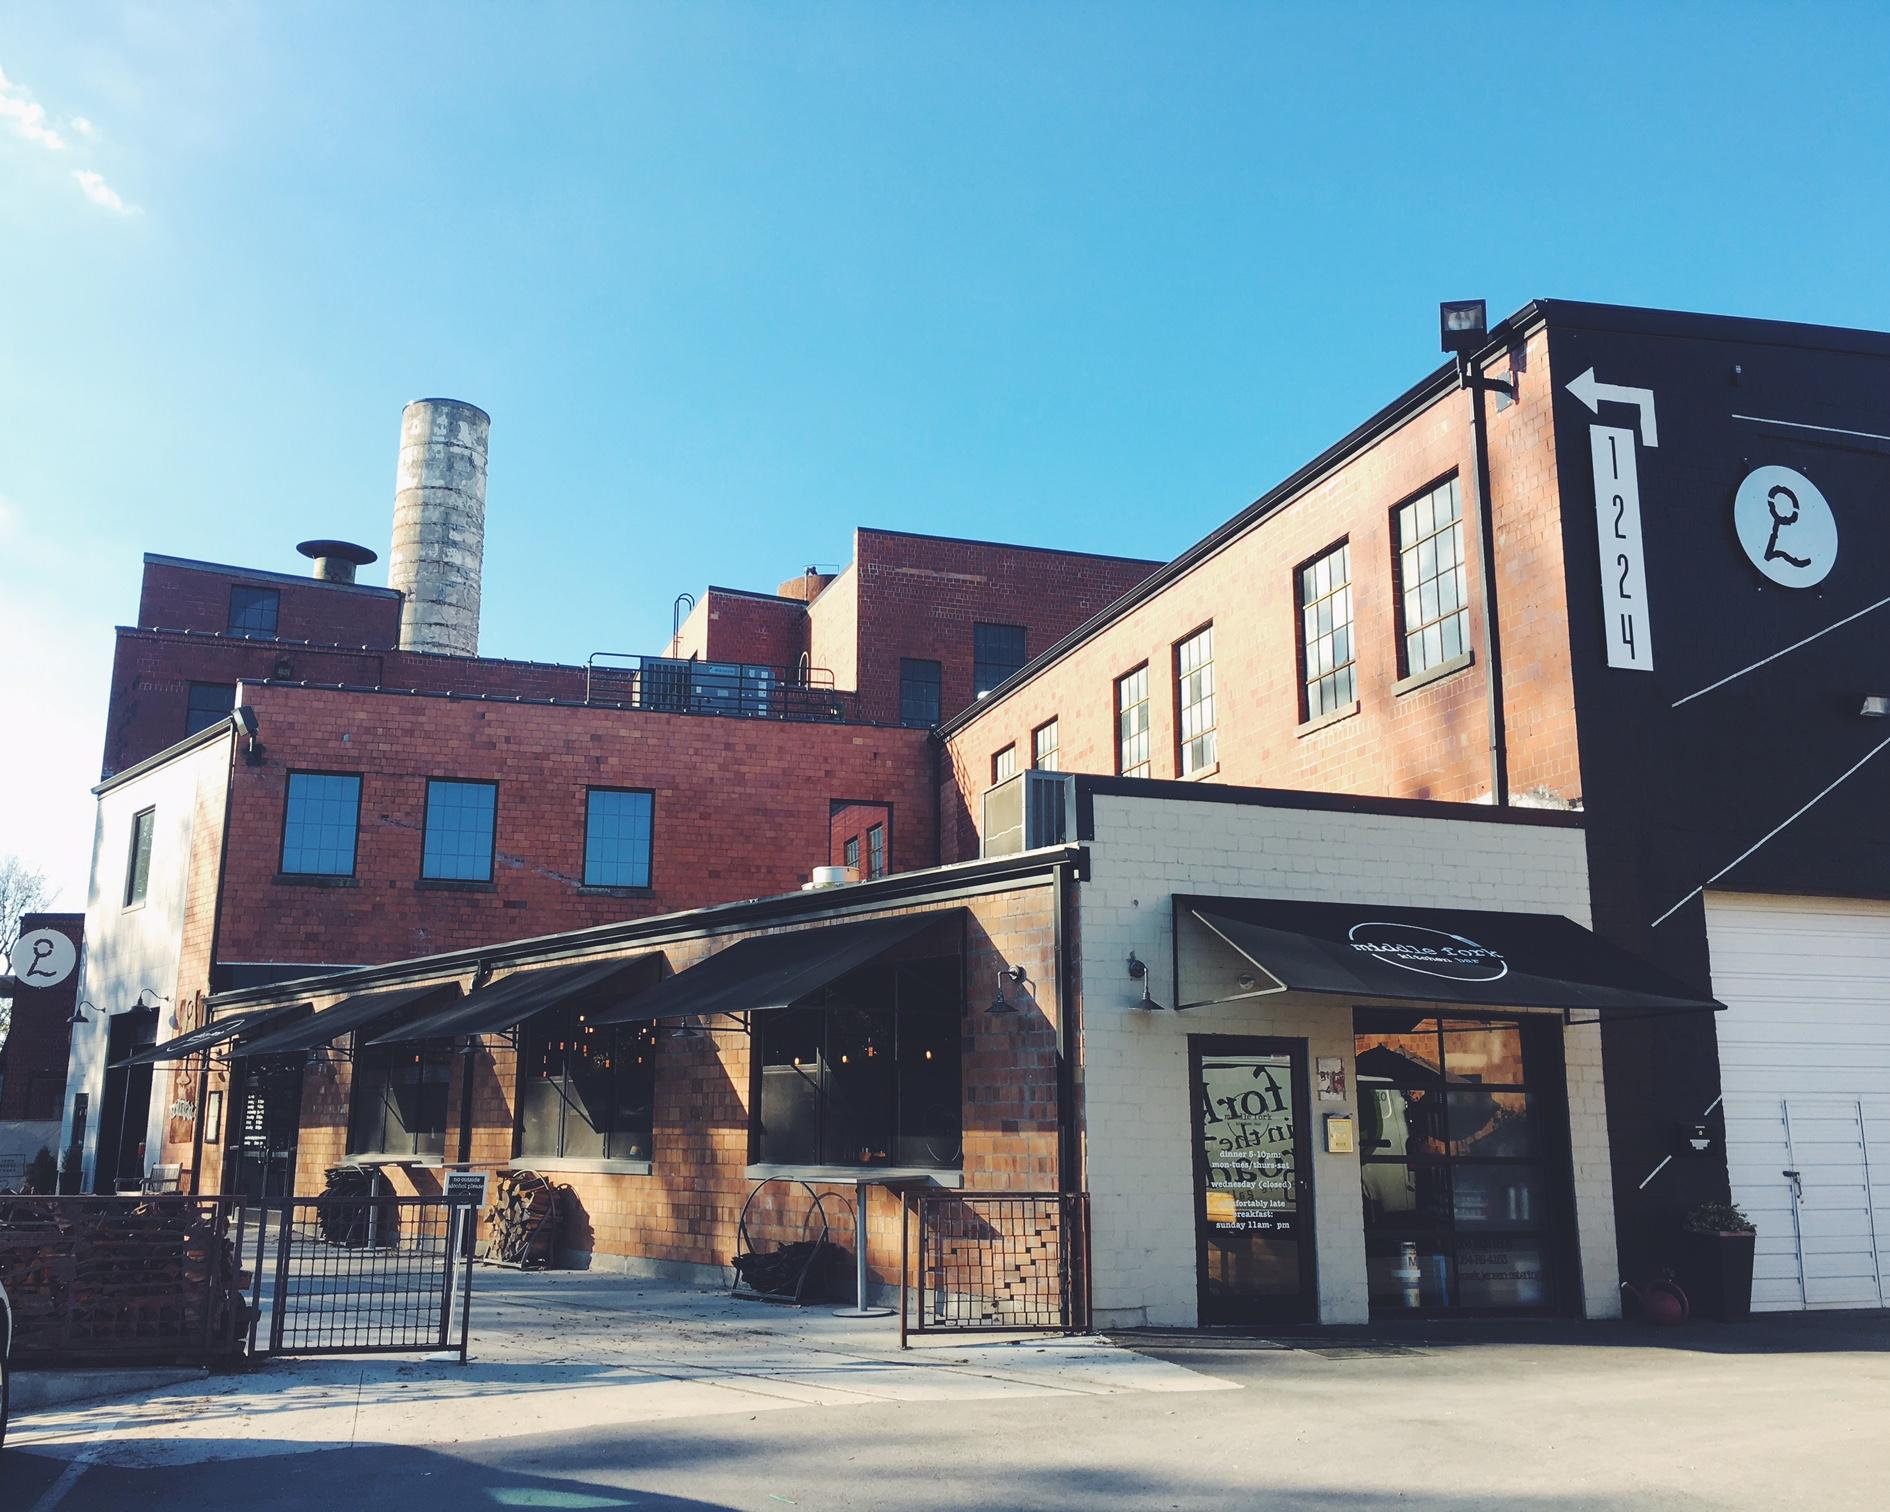 Ethereal Brewing in Lexington, Kentucky